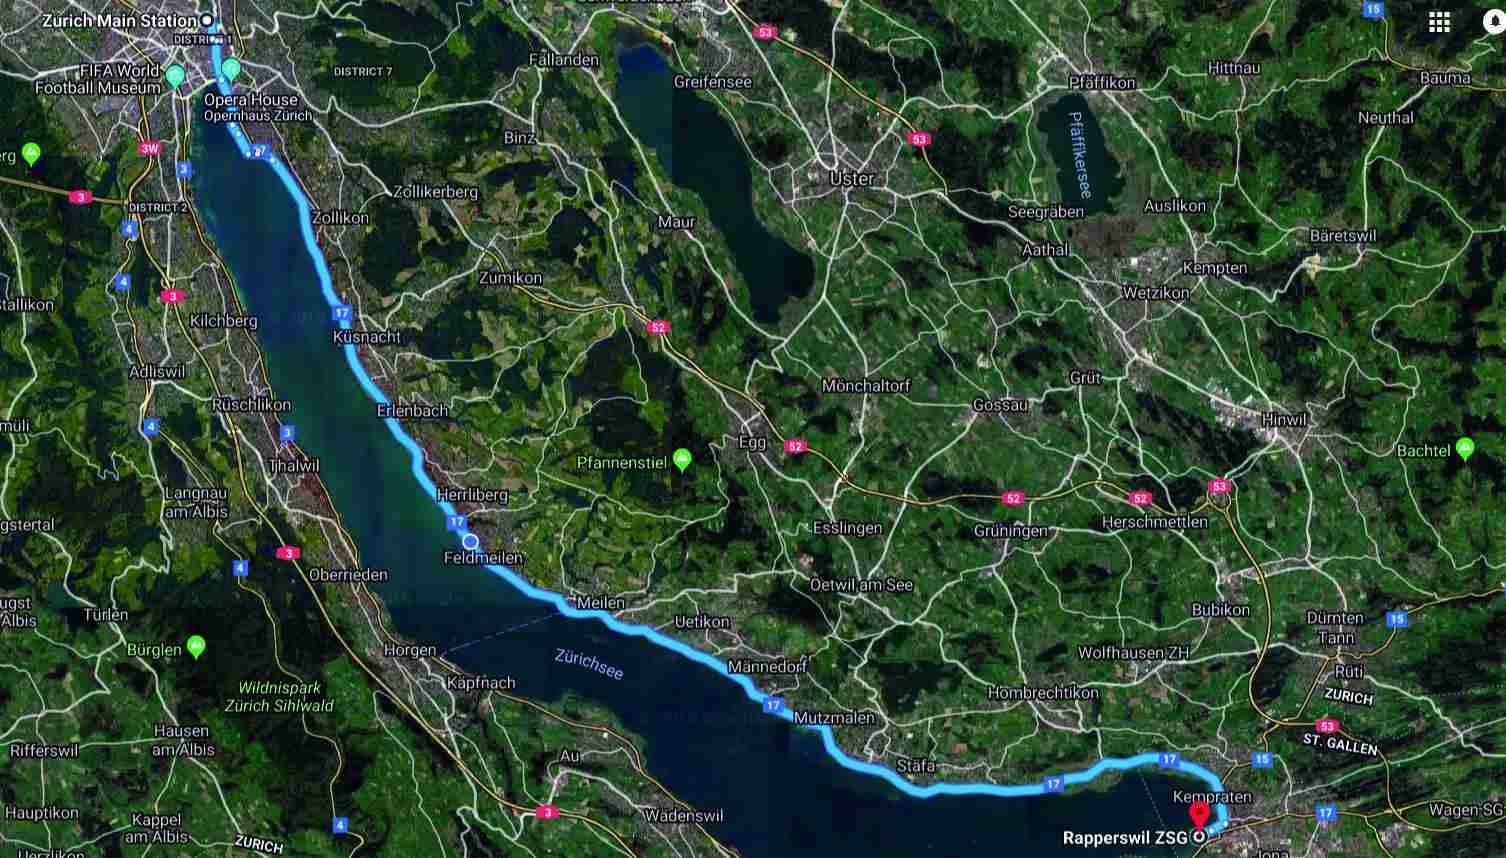 Zurich to Rapperswil